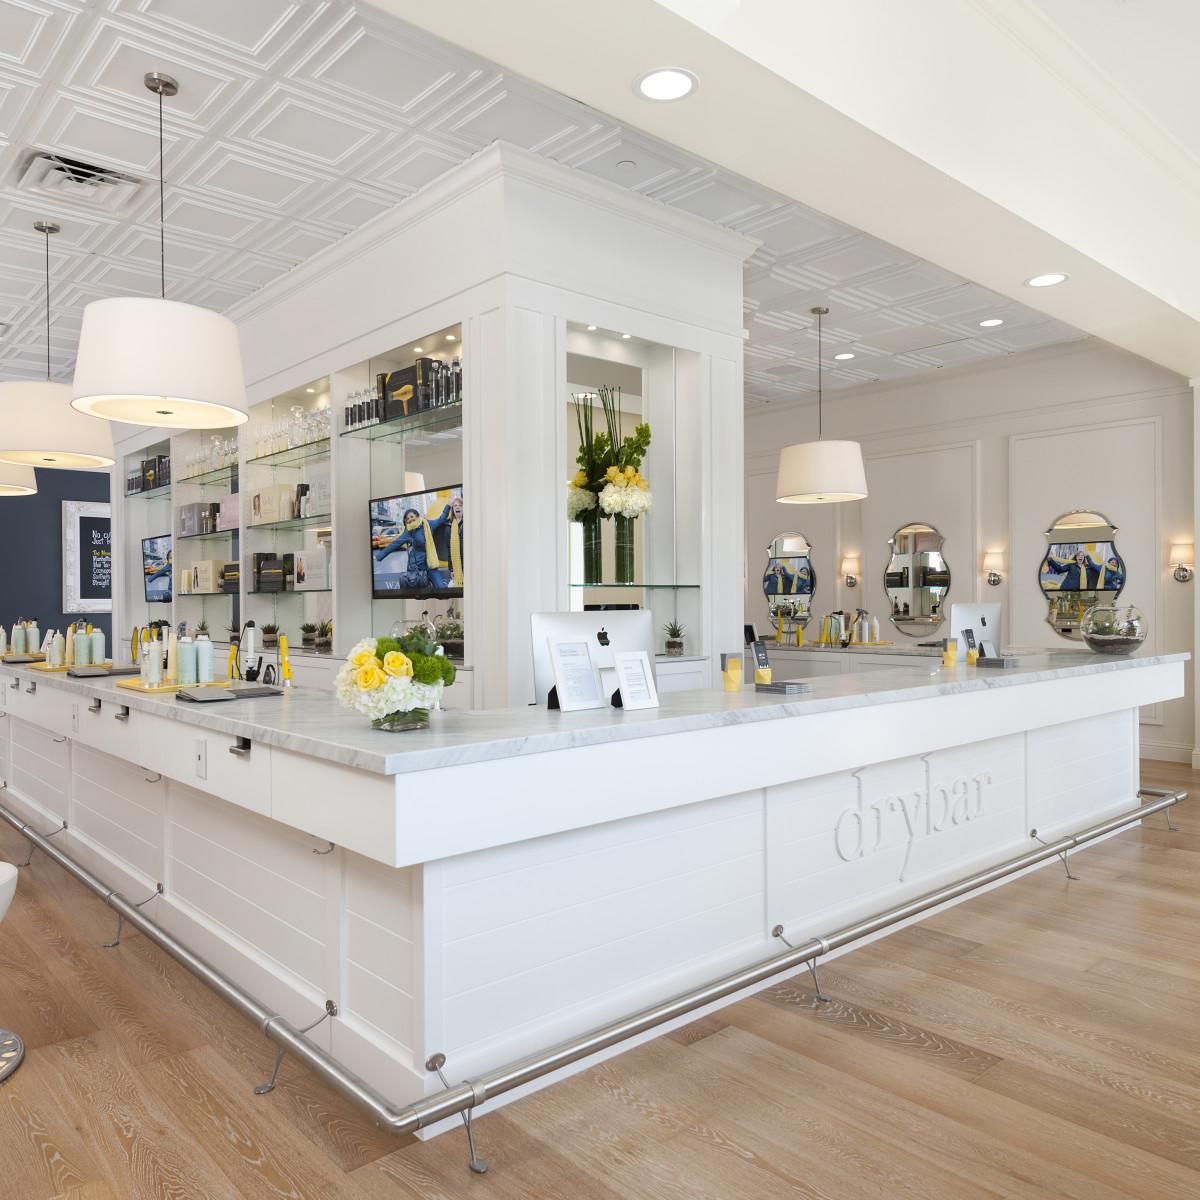 Fashion Nail Beauty Spa Elizabeth Nj: Shine Bright With These Hot New Houston Beauty Shops And